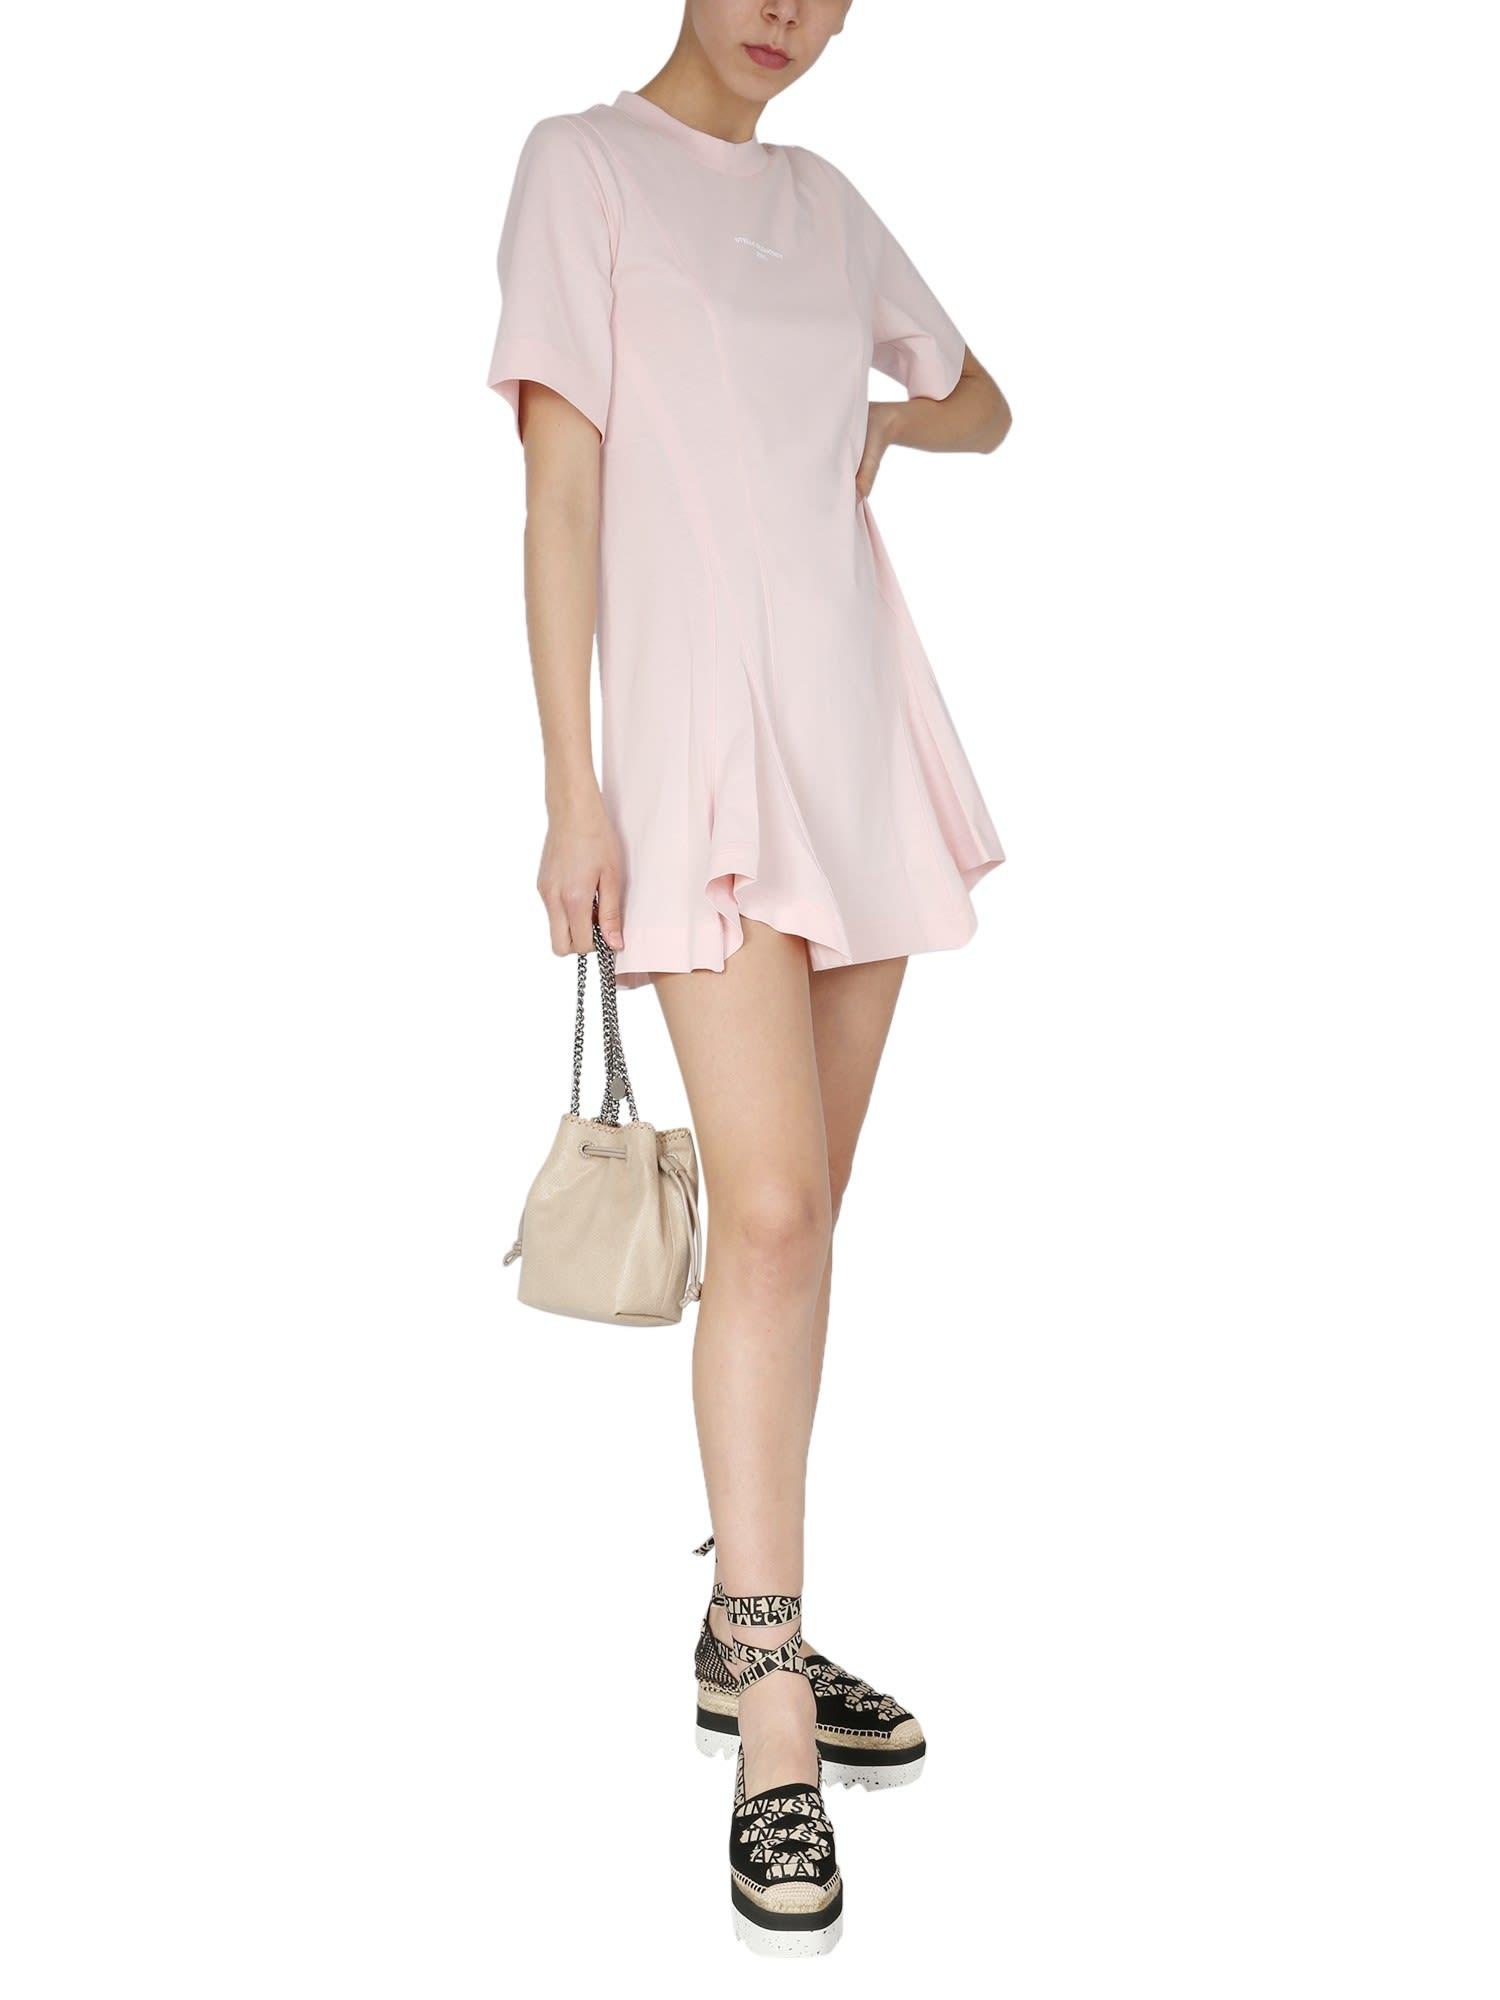 Buy Stella McCartney T-shirt Dress With Logo Print online, shop Stella McCartney with free shipping